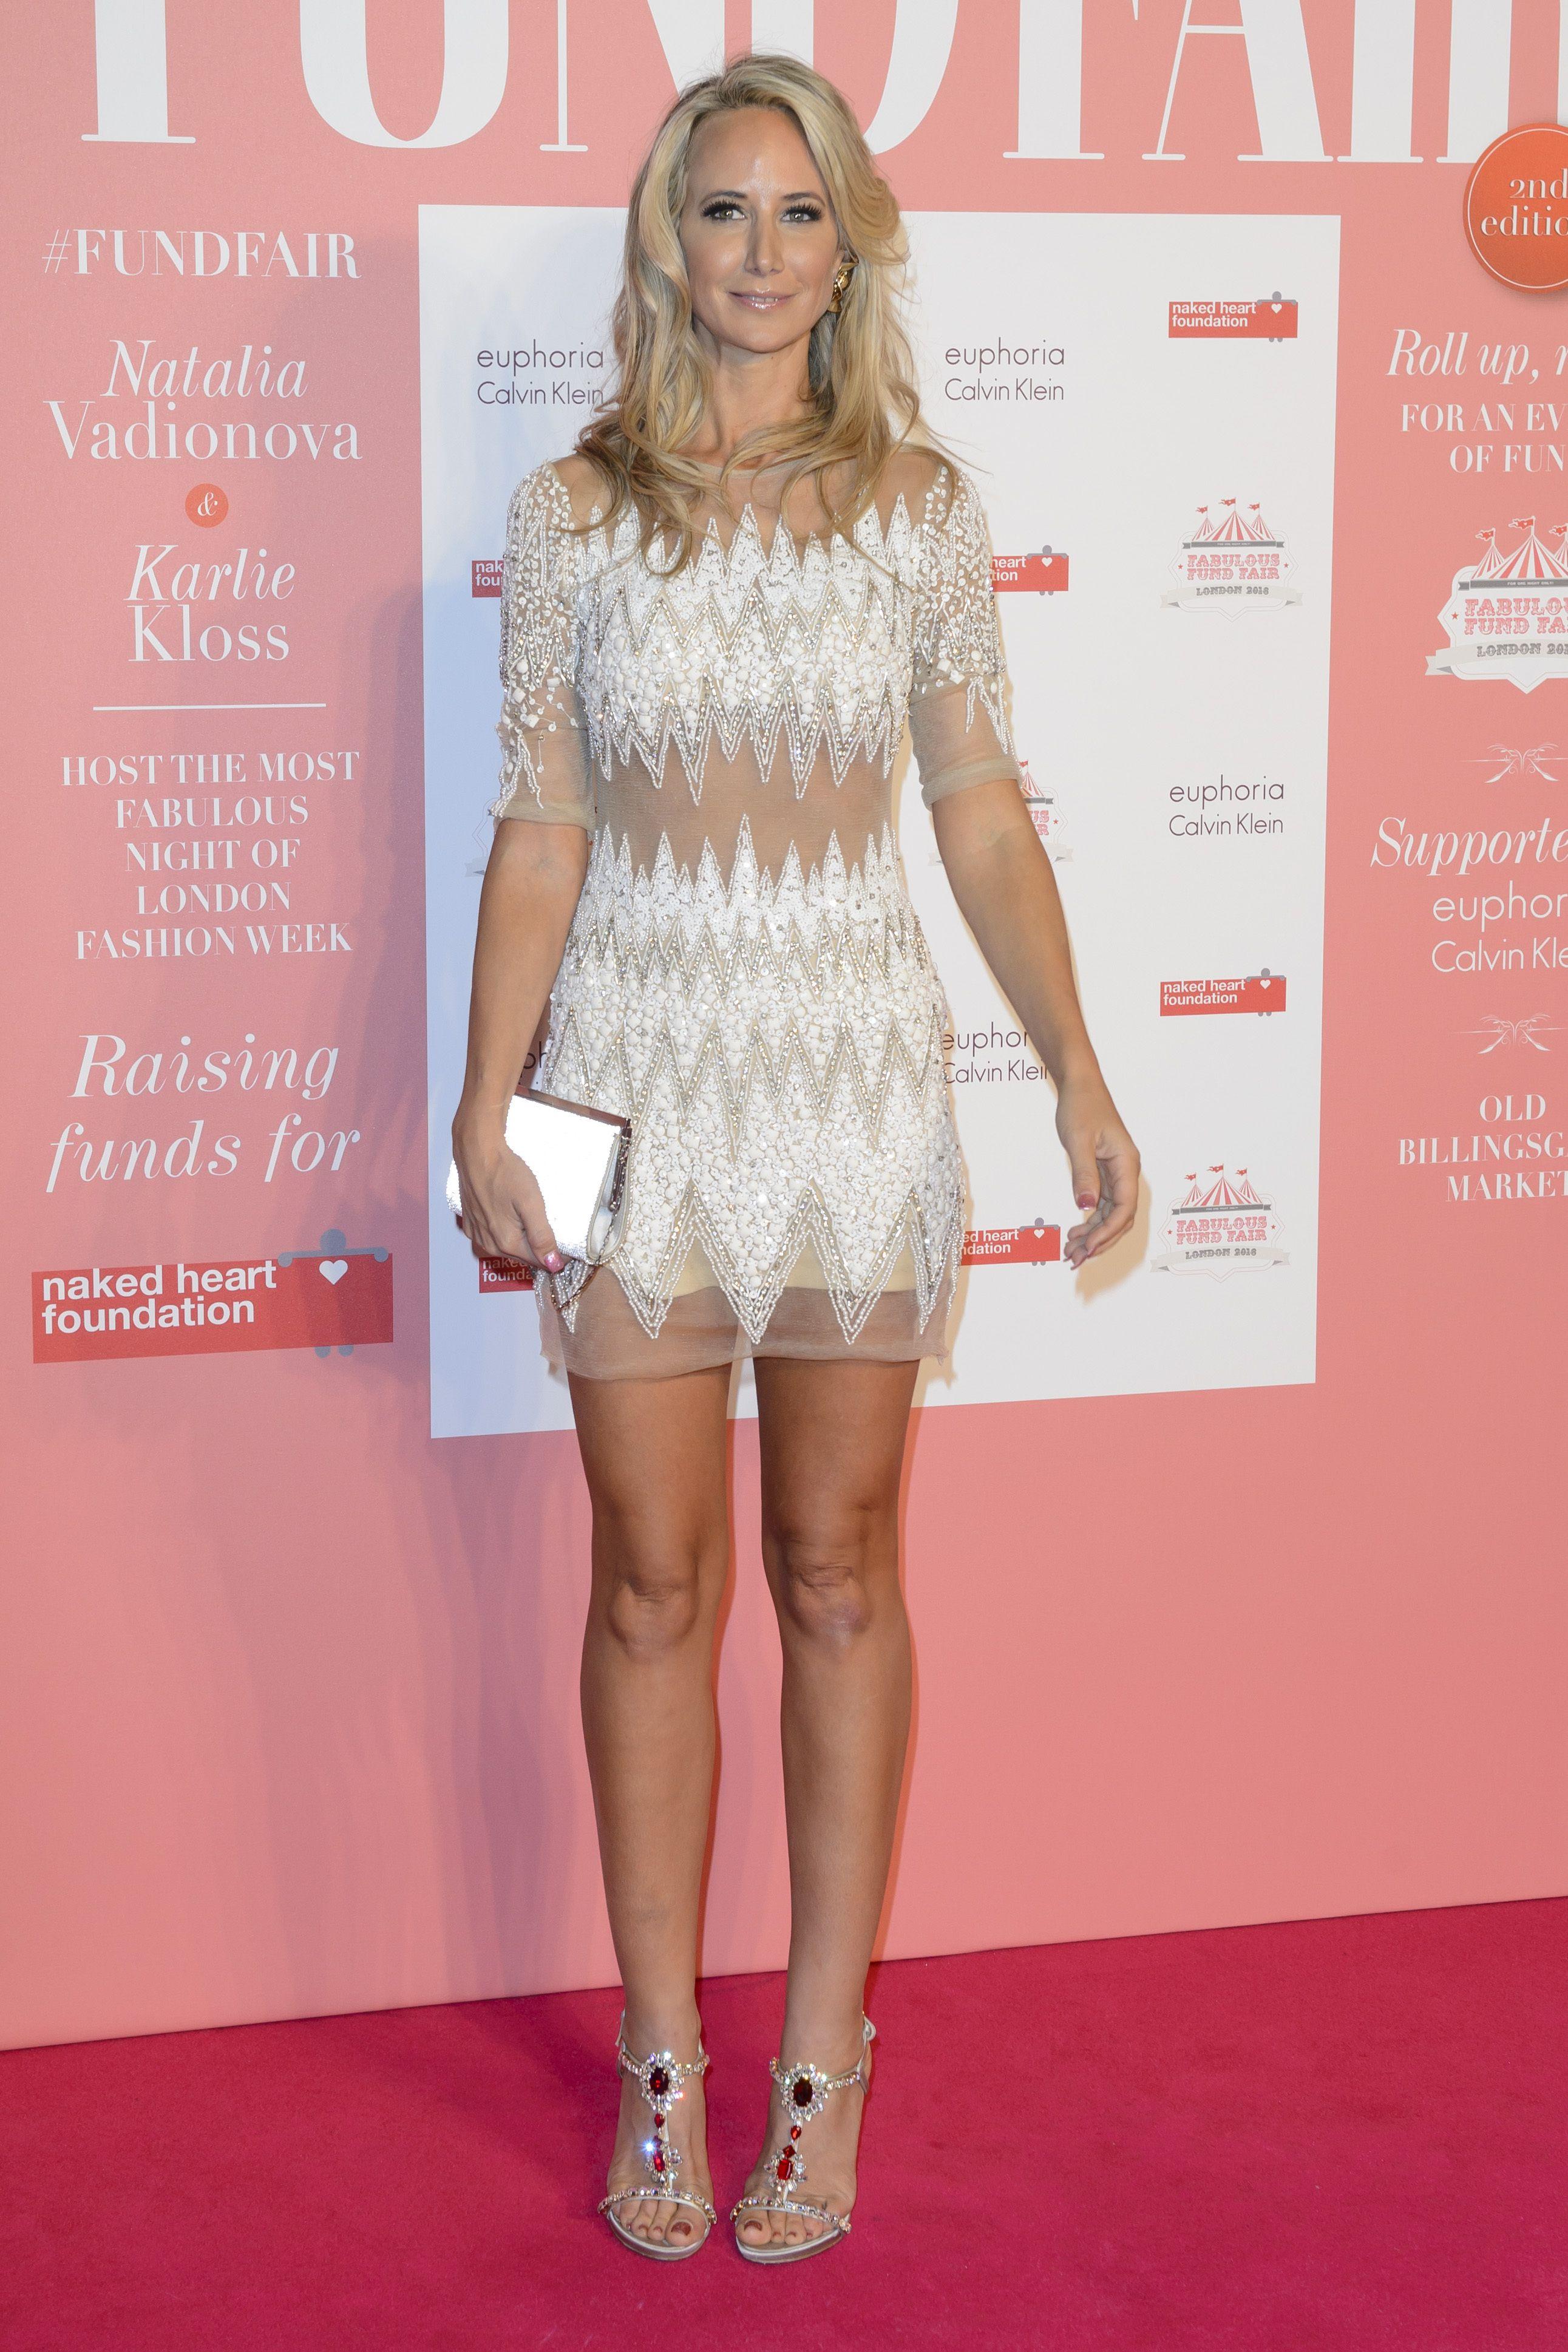 http://pics.wikifeet.com/Lady-Victoria-Hervey-Feet-2132427.jpg ...